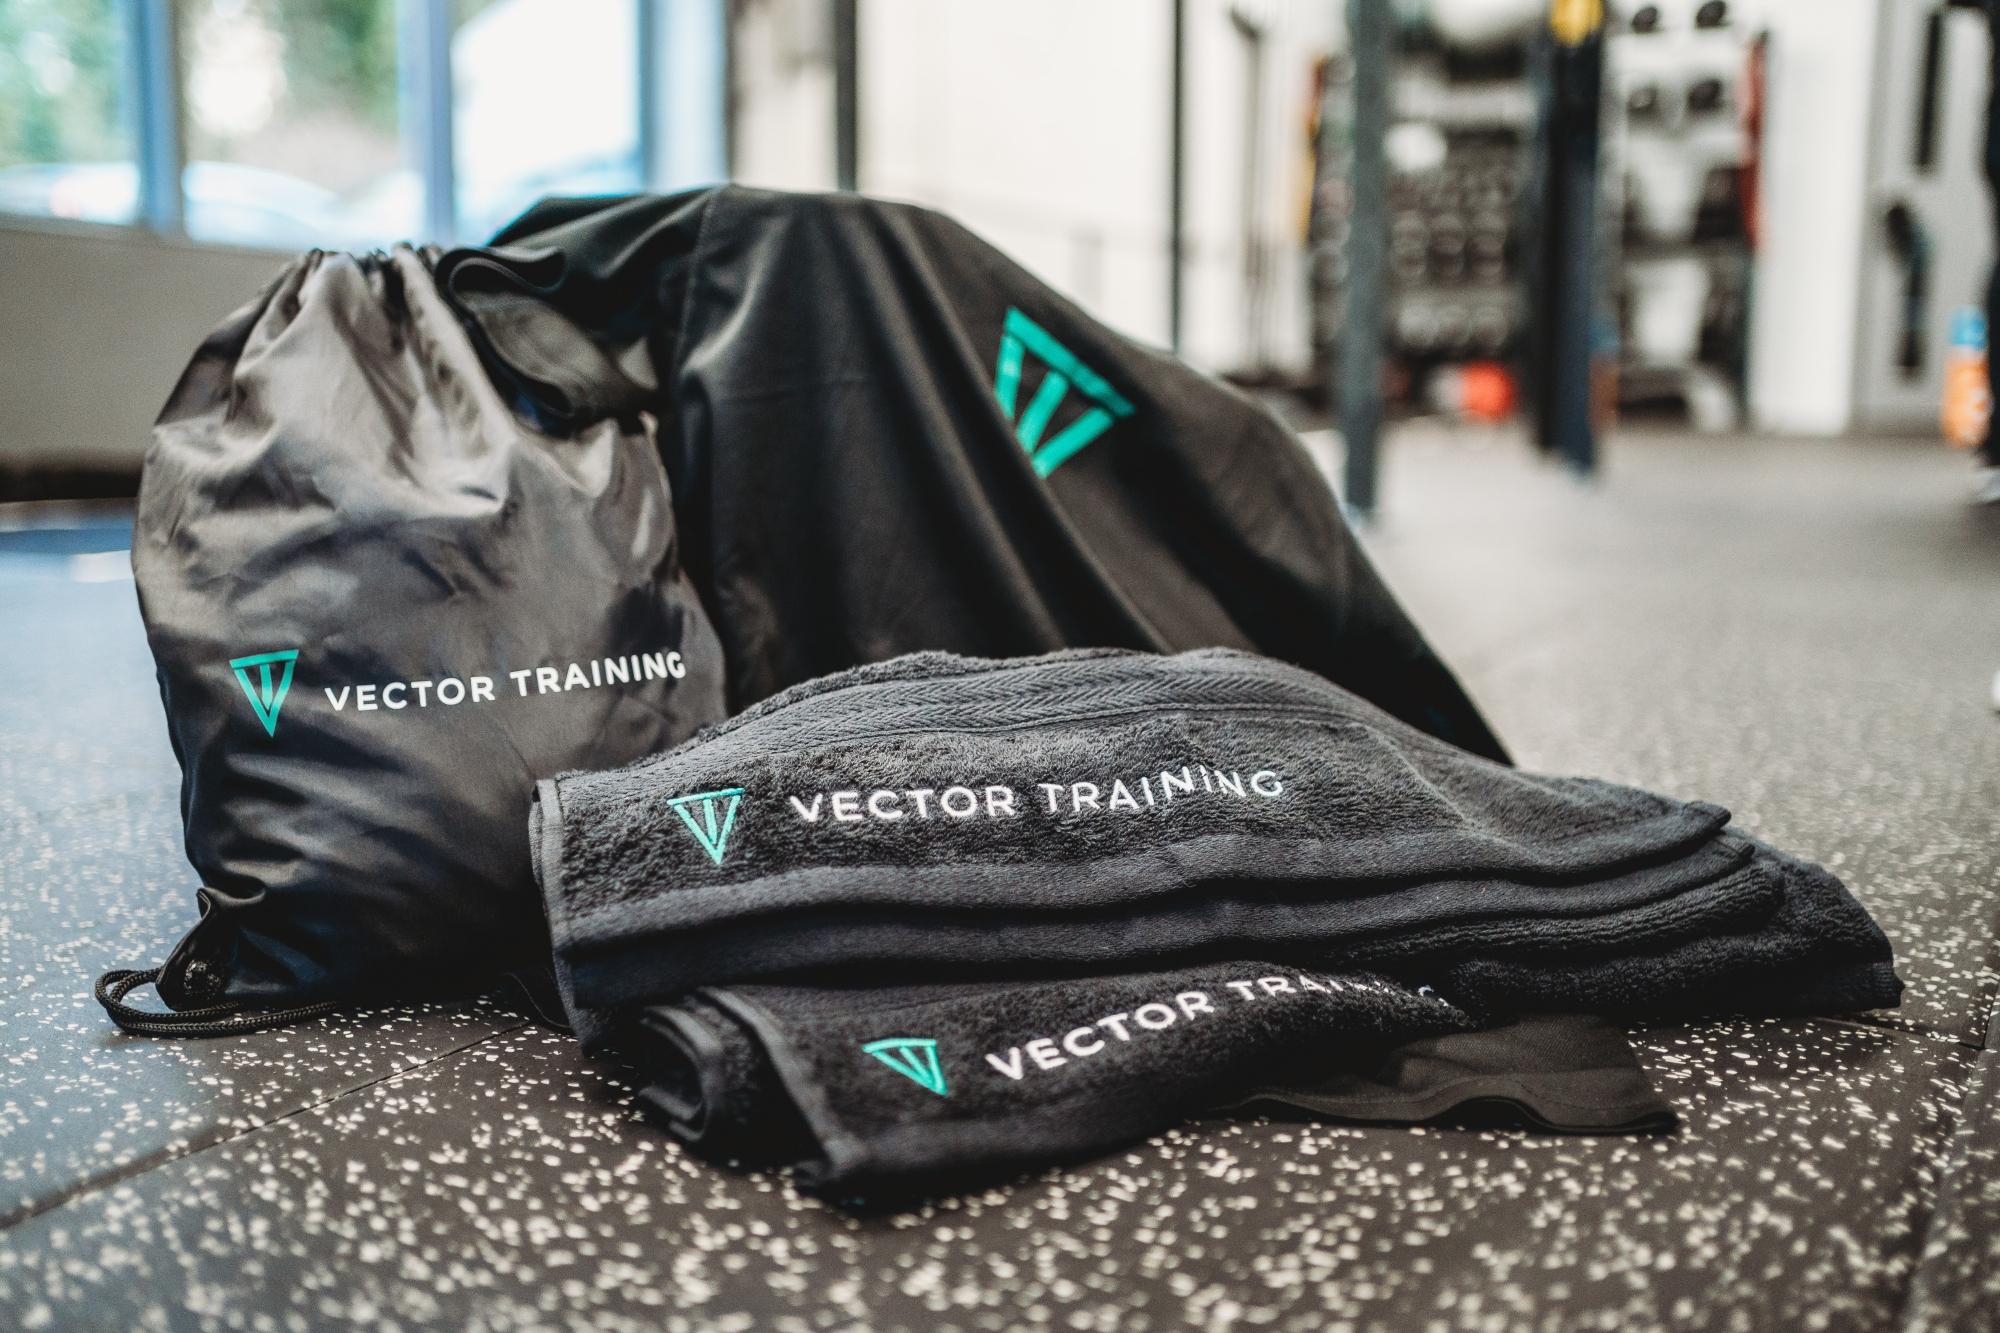 Vector Training manchester